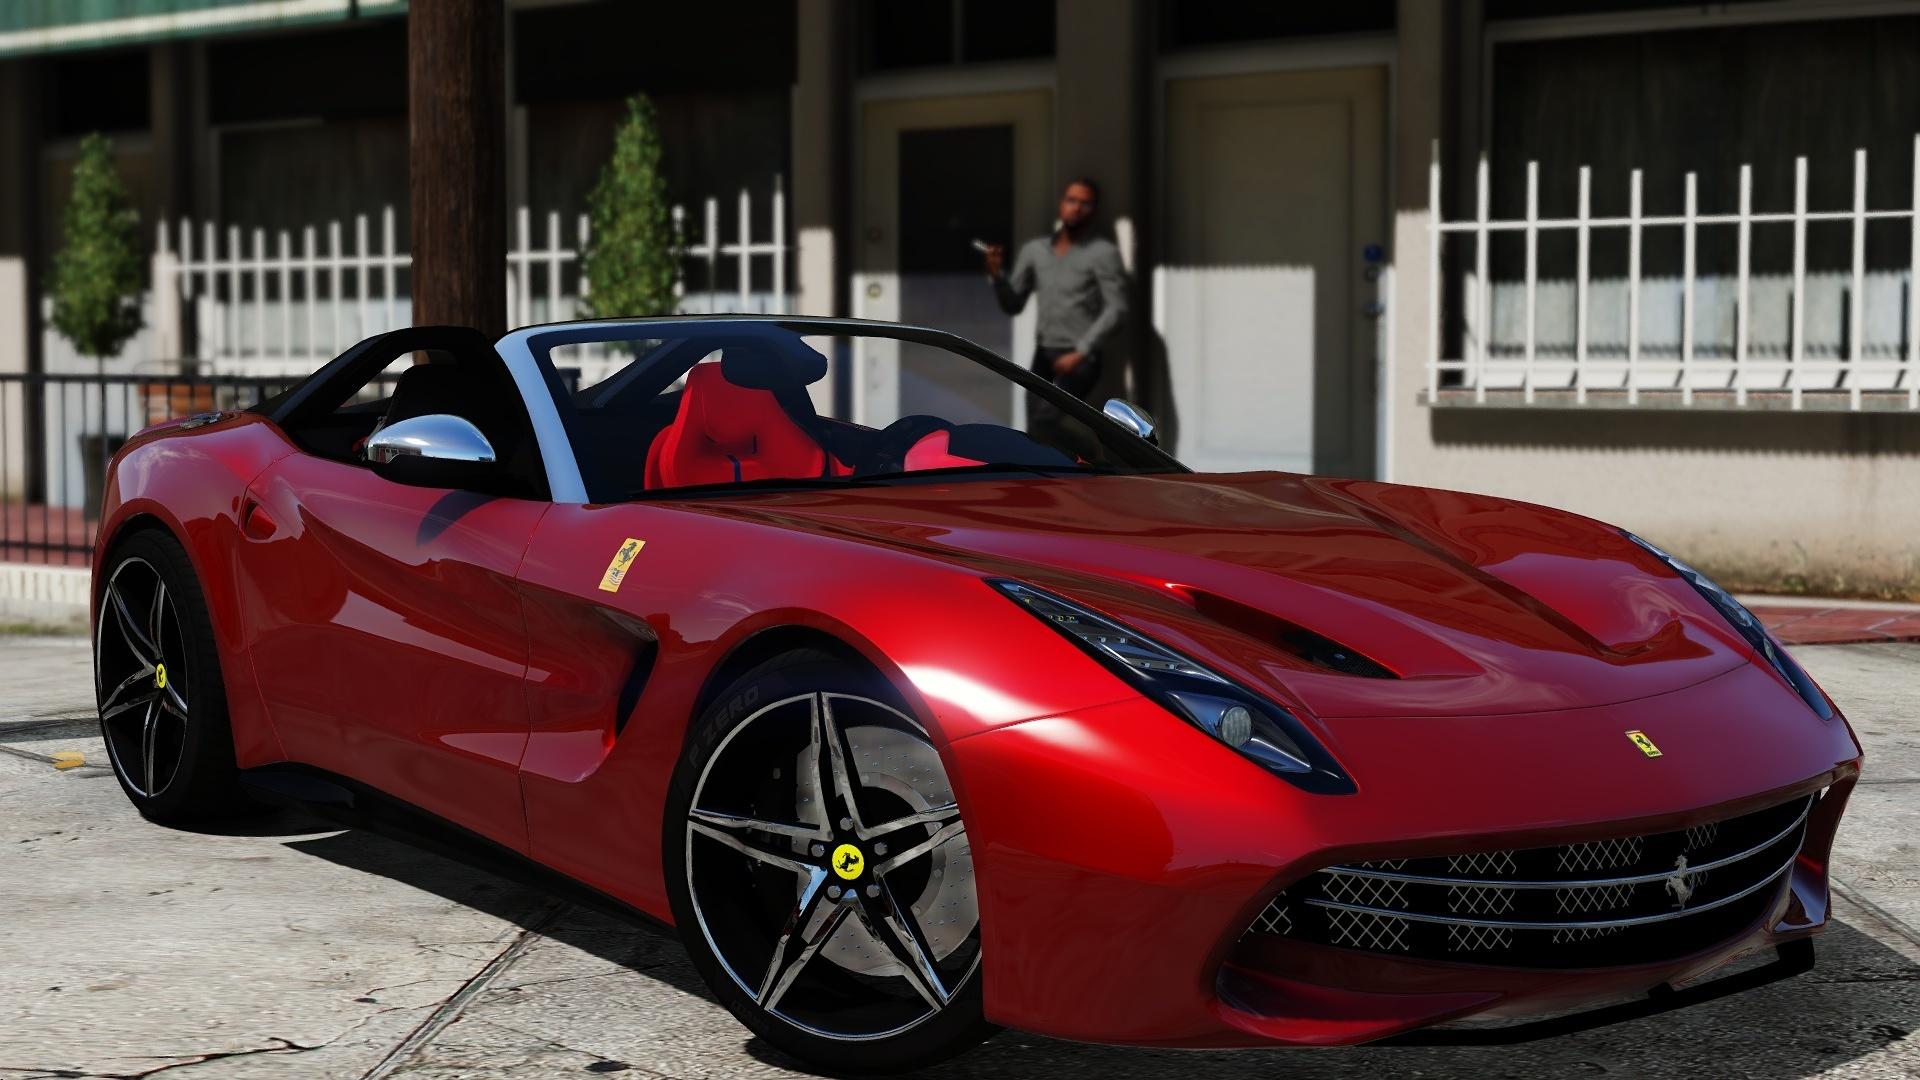 The Ferrari F60